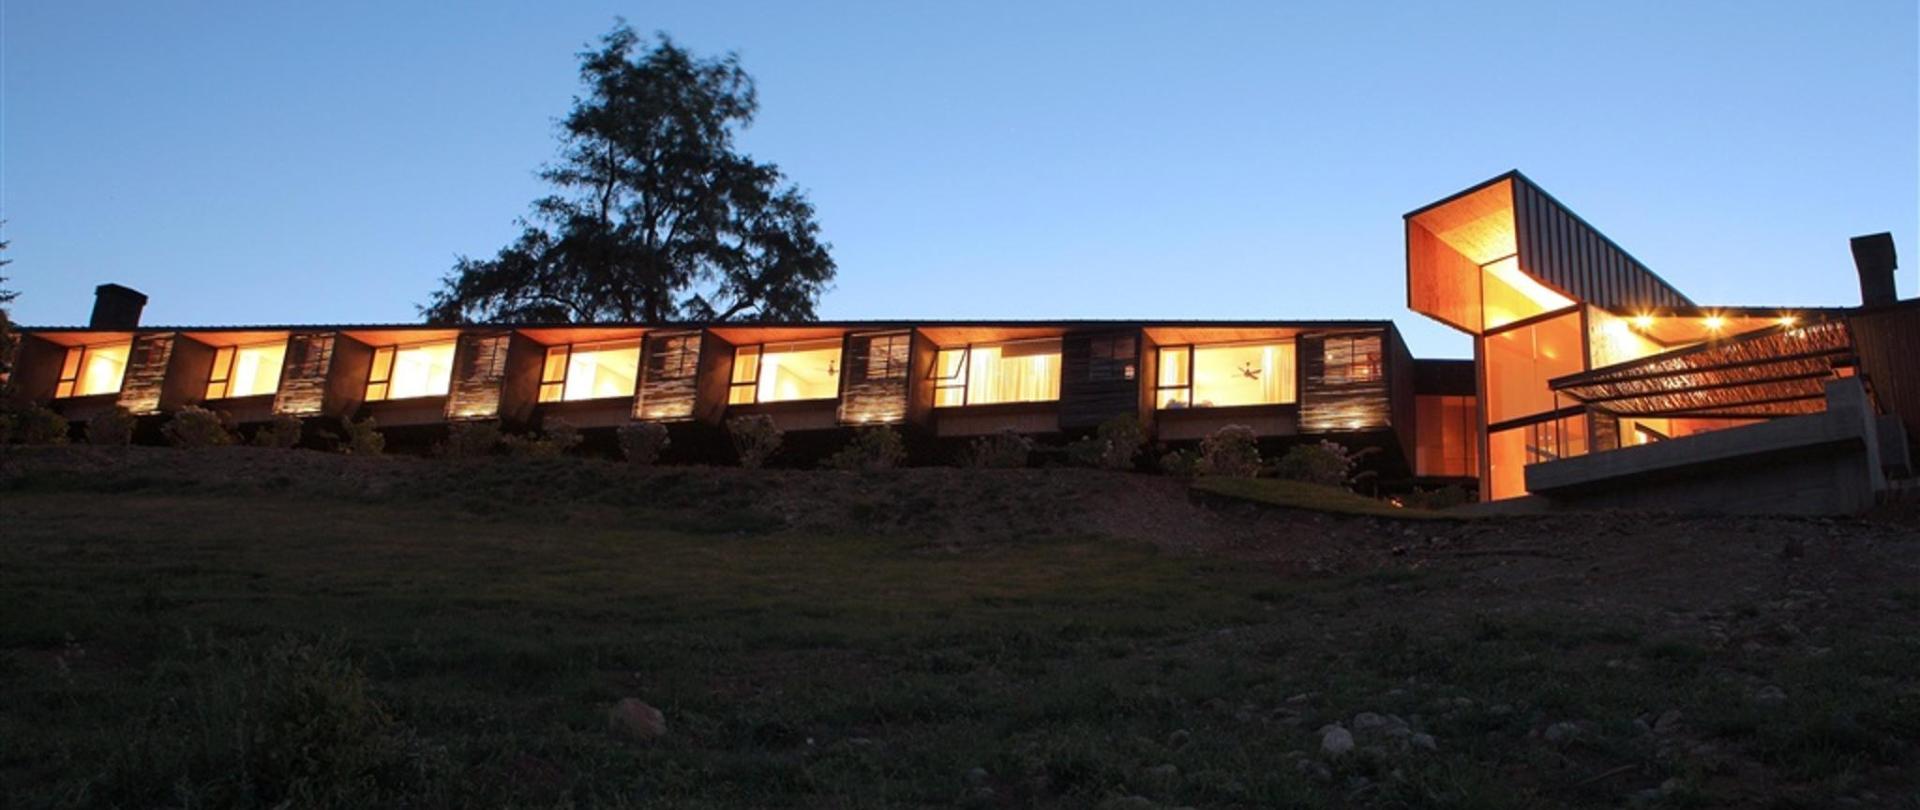 Hotel Casa Panguipulli